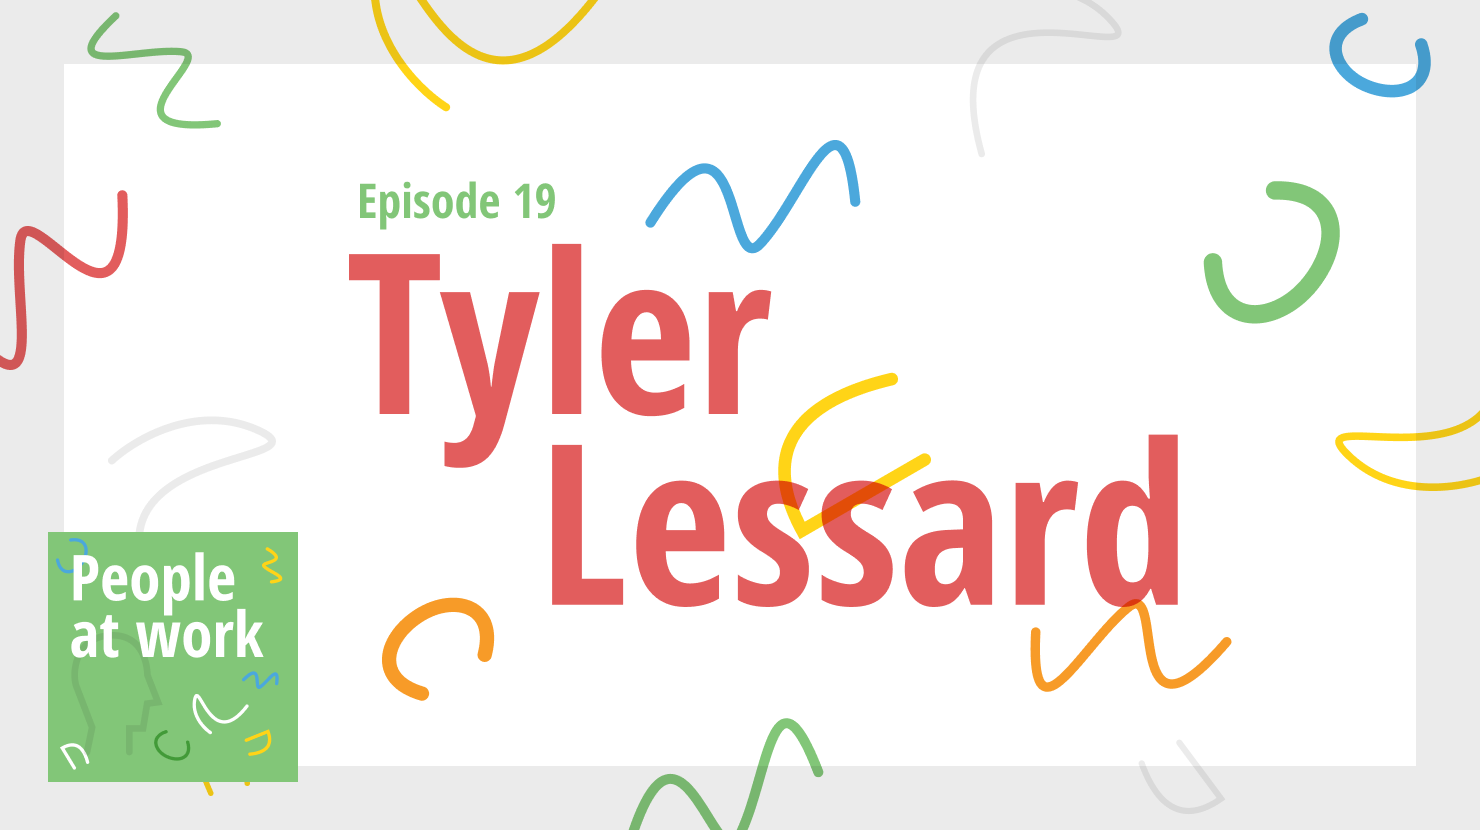 Tyler Lessard on creating a strong business brand through a strong internal culture